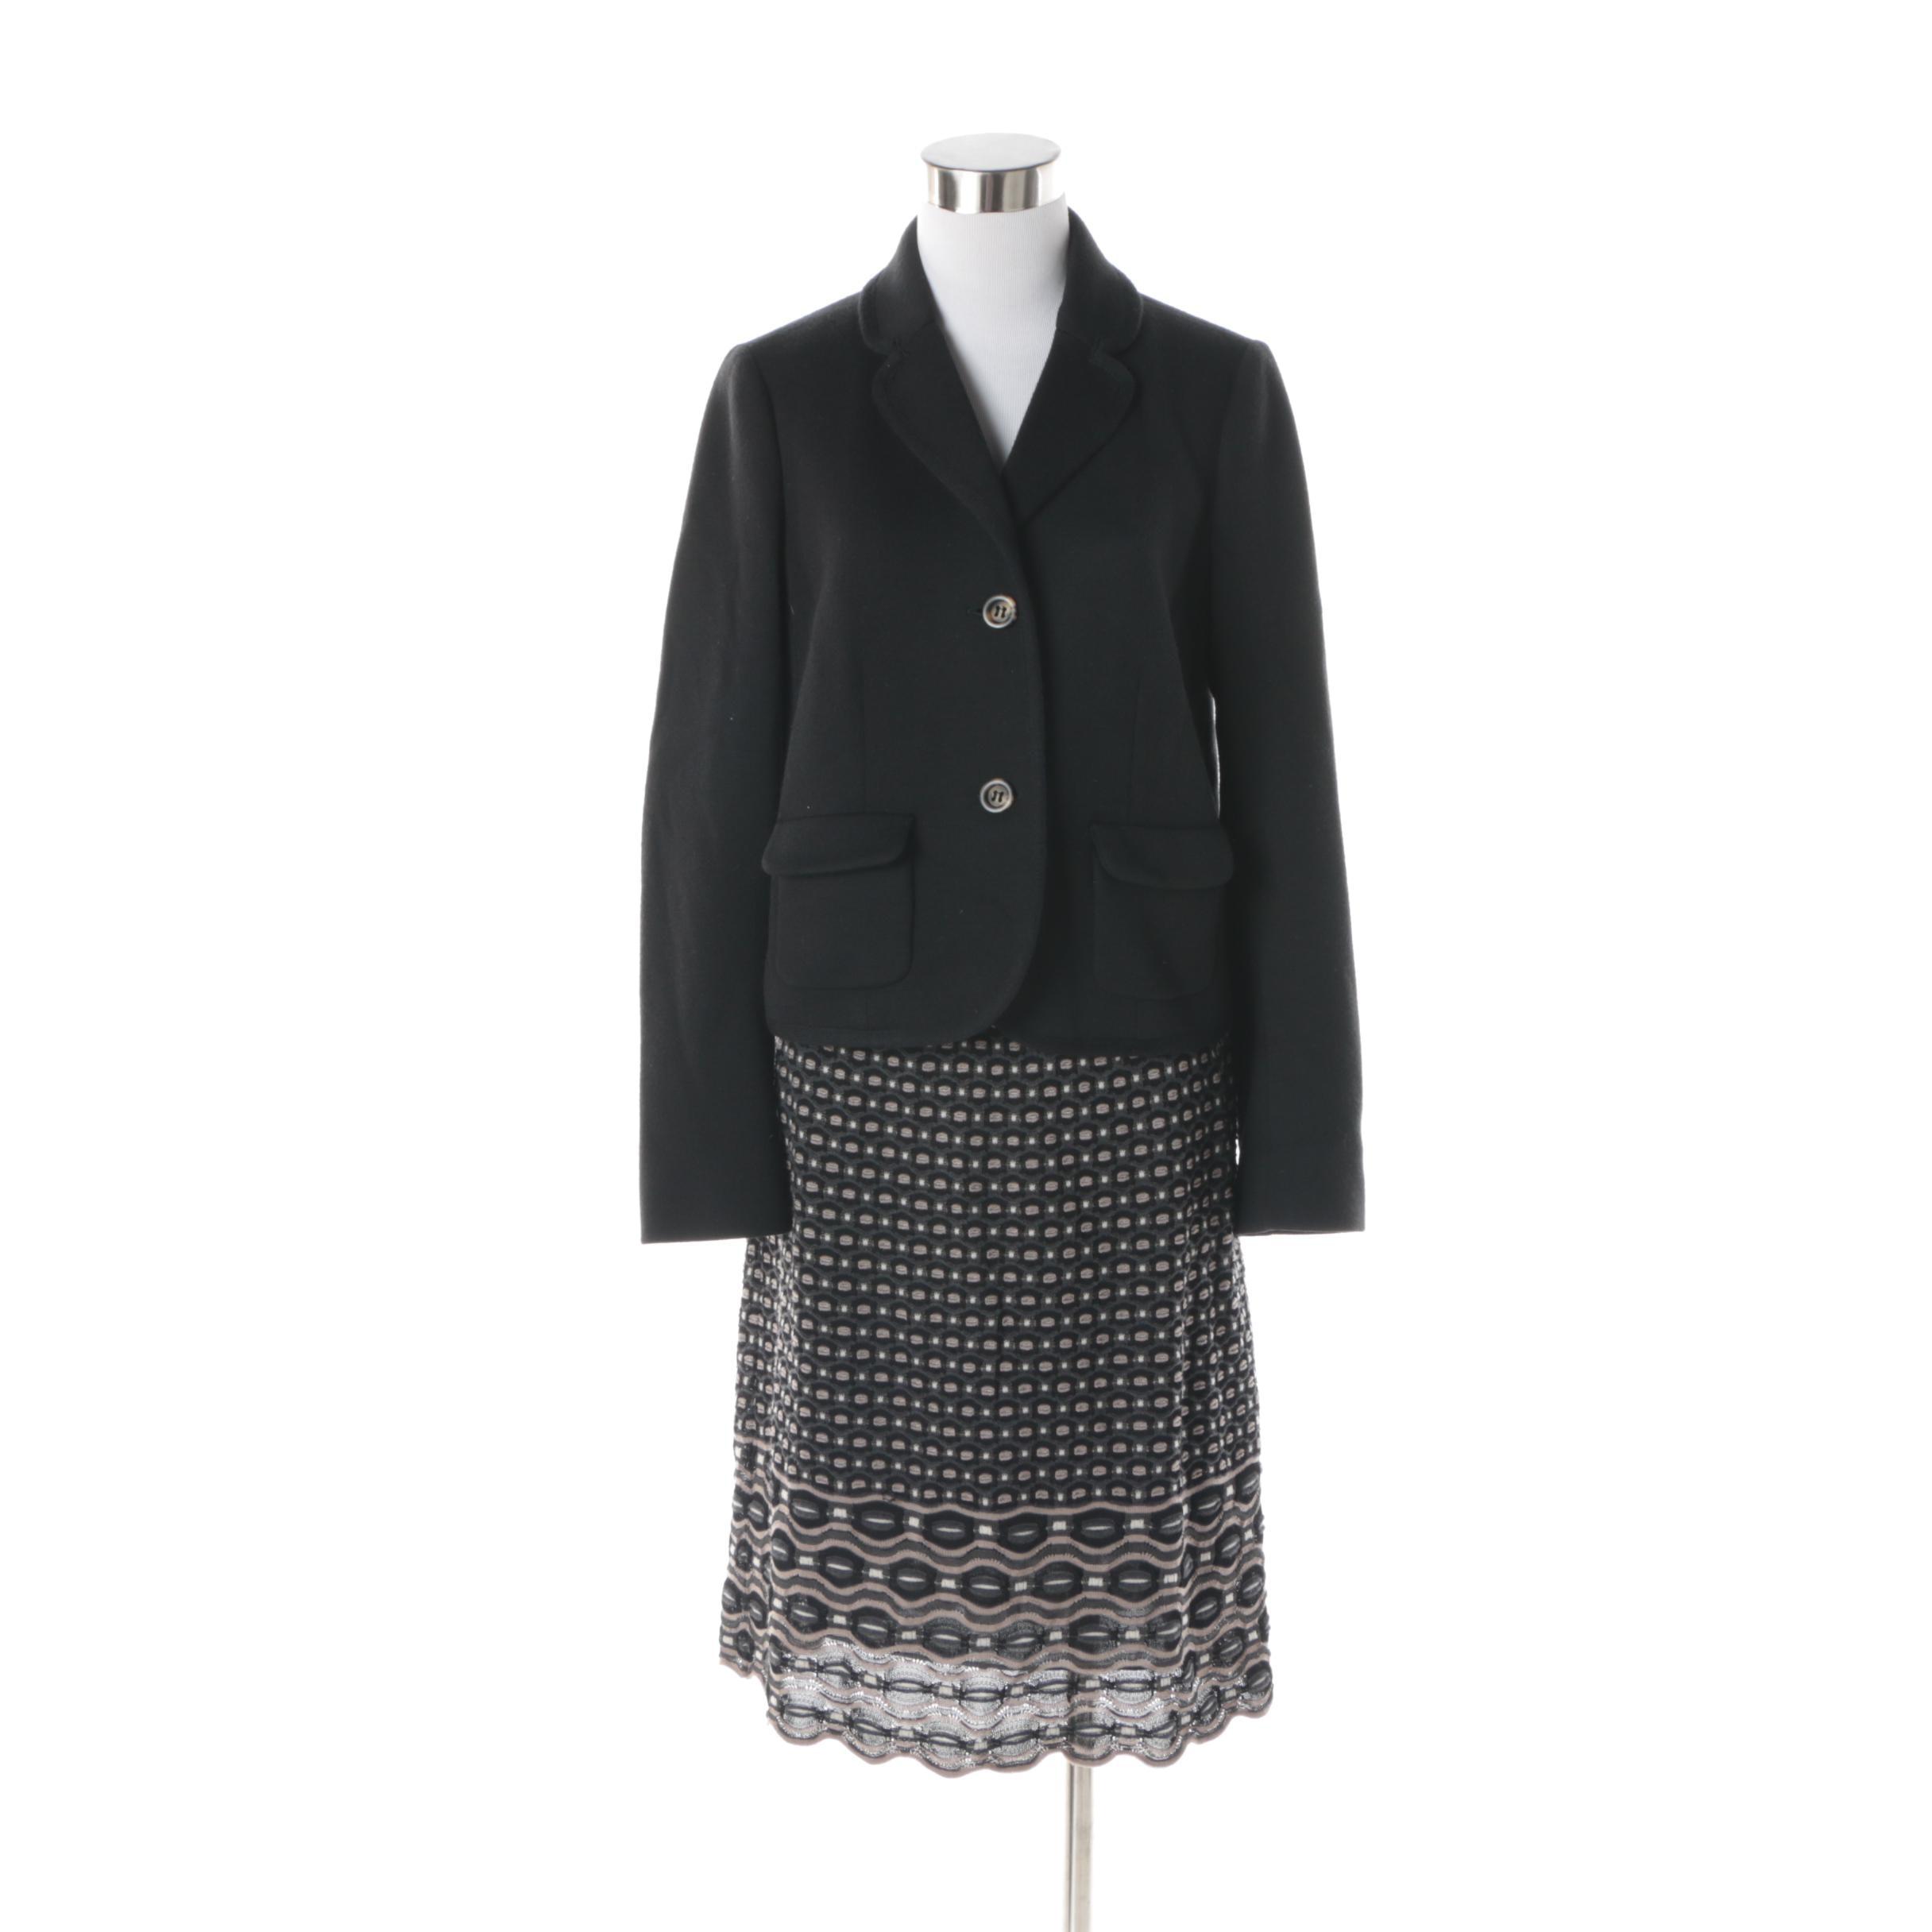 Women's Missoni Black Wool Blend Jacket and Knit Skirt